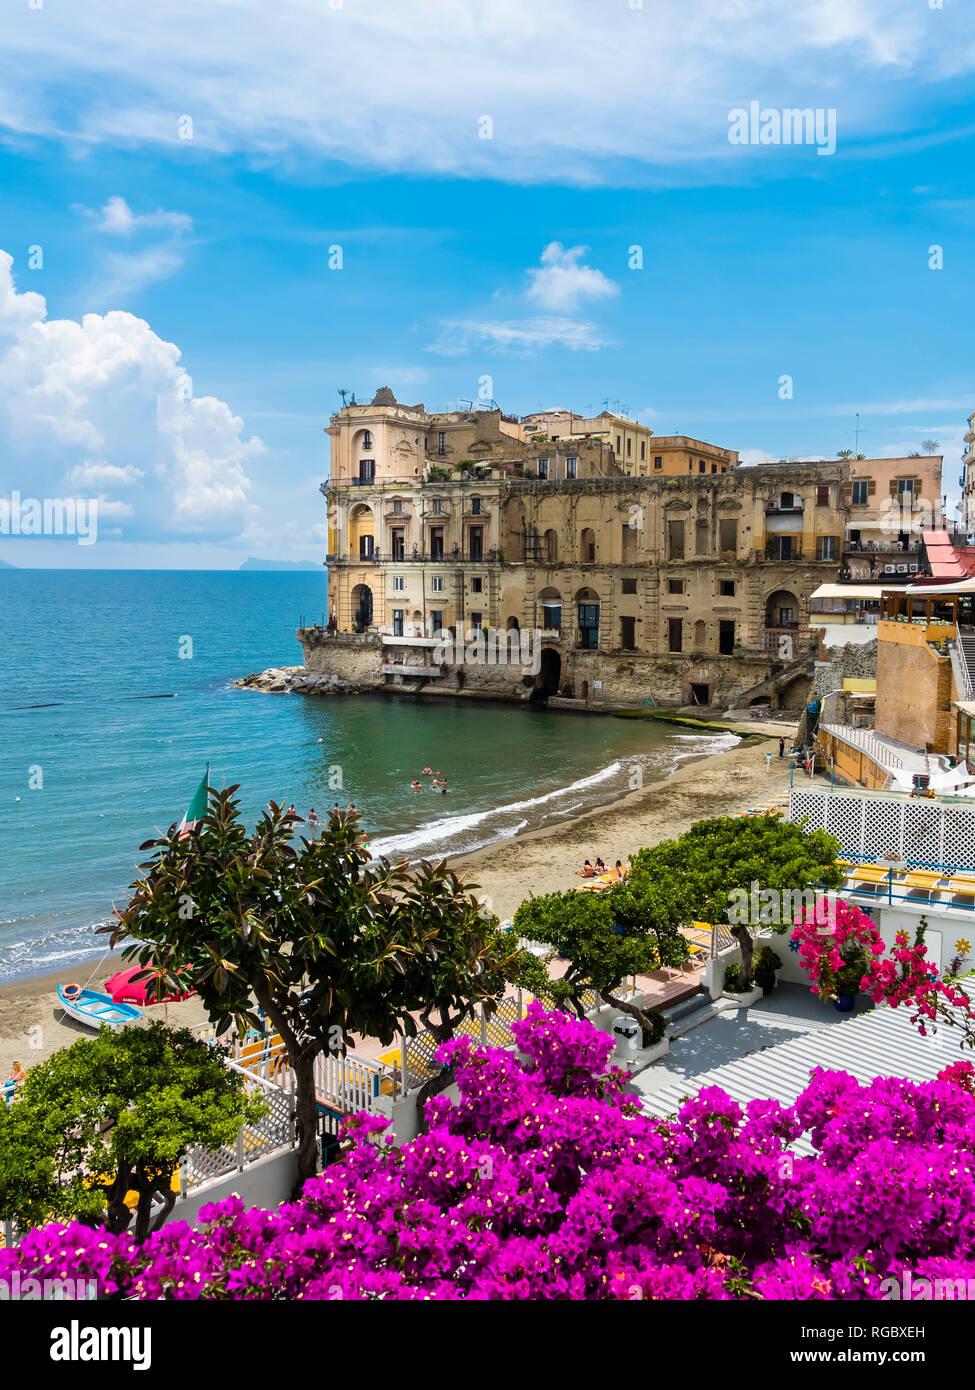 Italy, Campania, Neaples, Palazzo Donn'Anna at Gulf of Naples - Stock Image